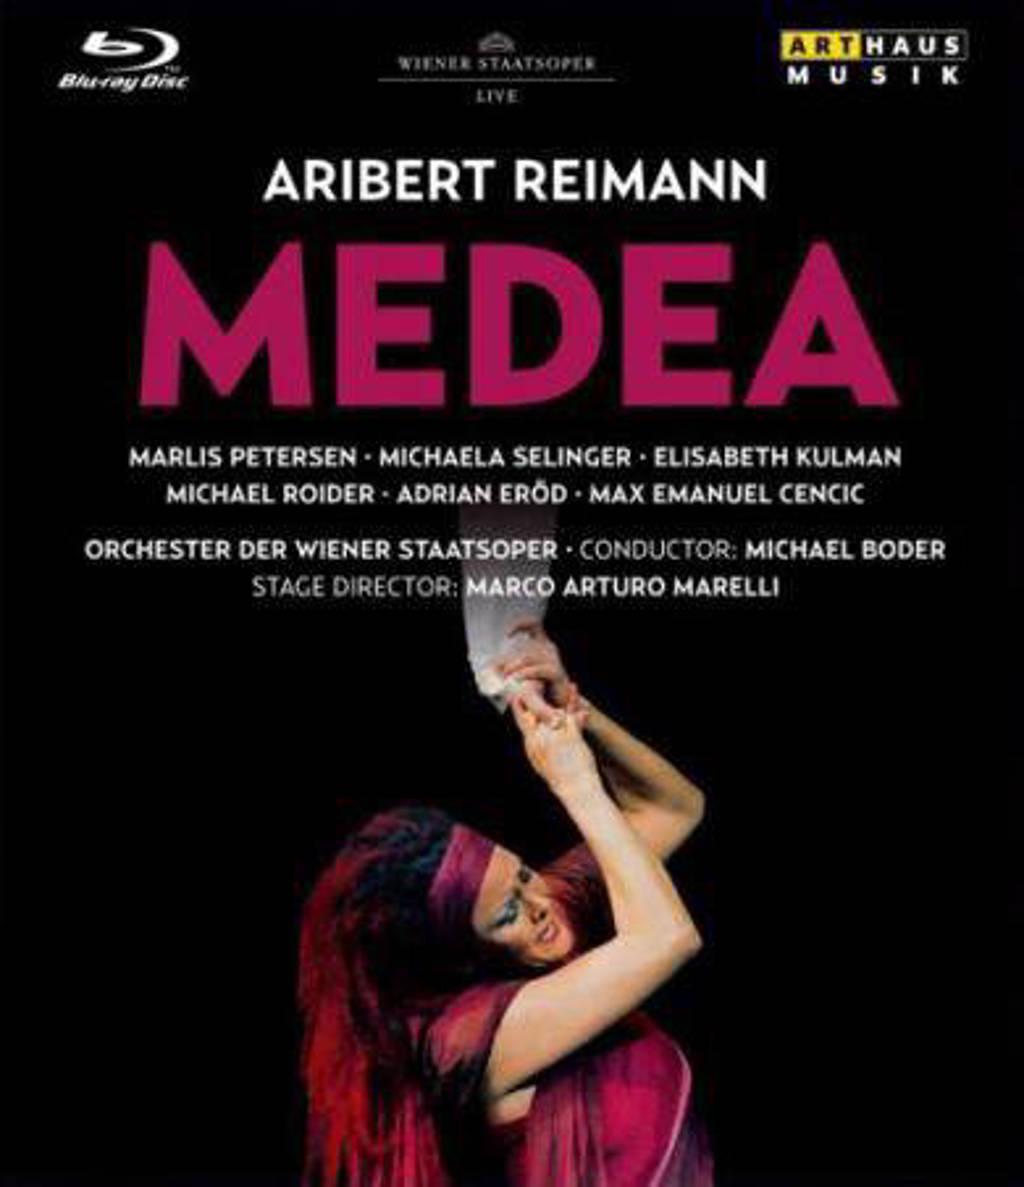 Petersen,Selinger,Kulman,Roider - Medea Weense Staatsopera 2010,Blura (Blu-ray)